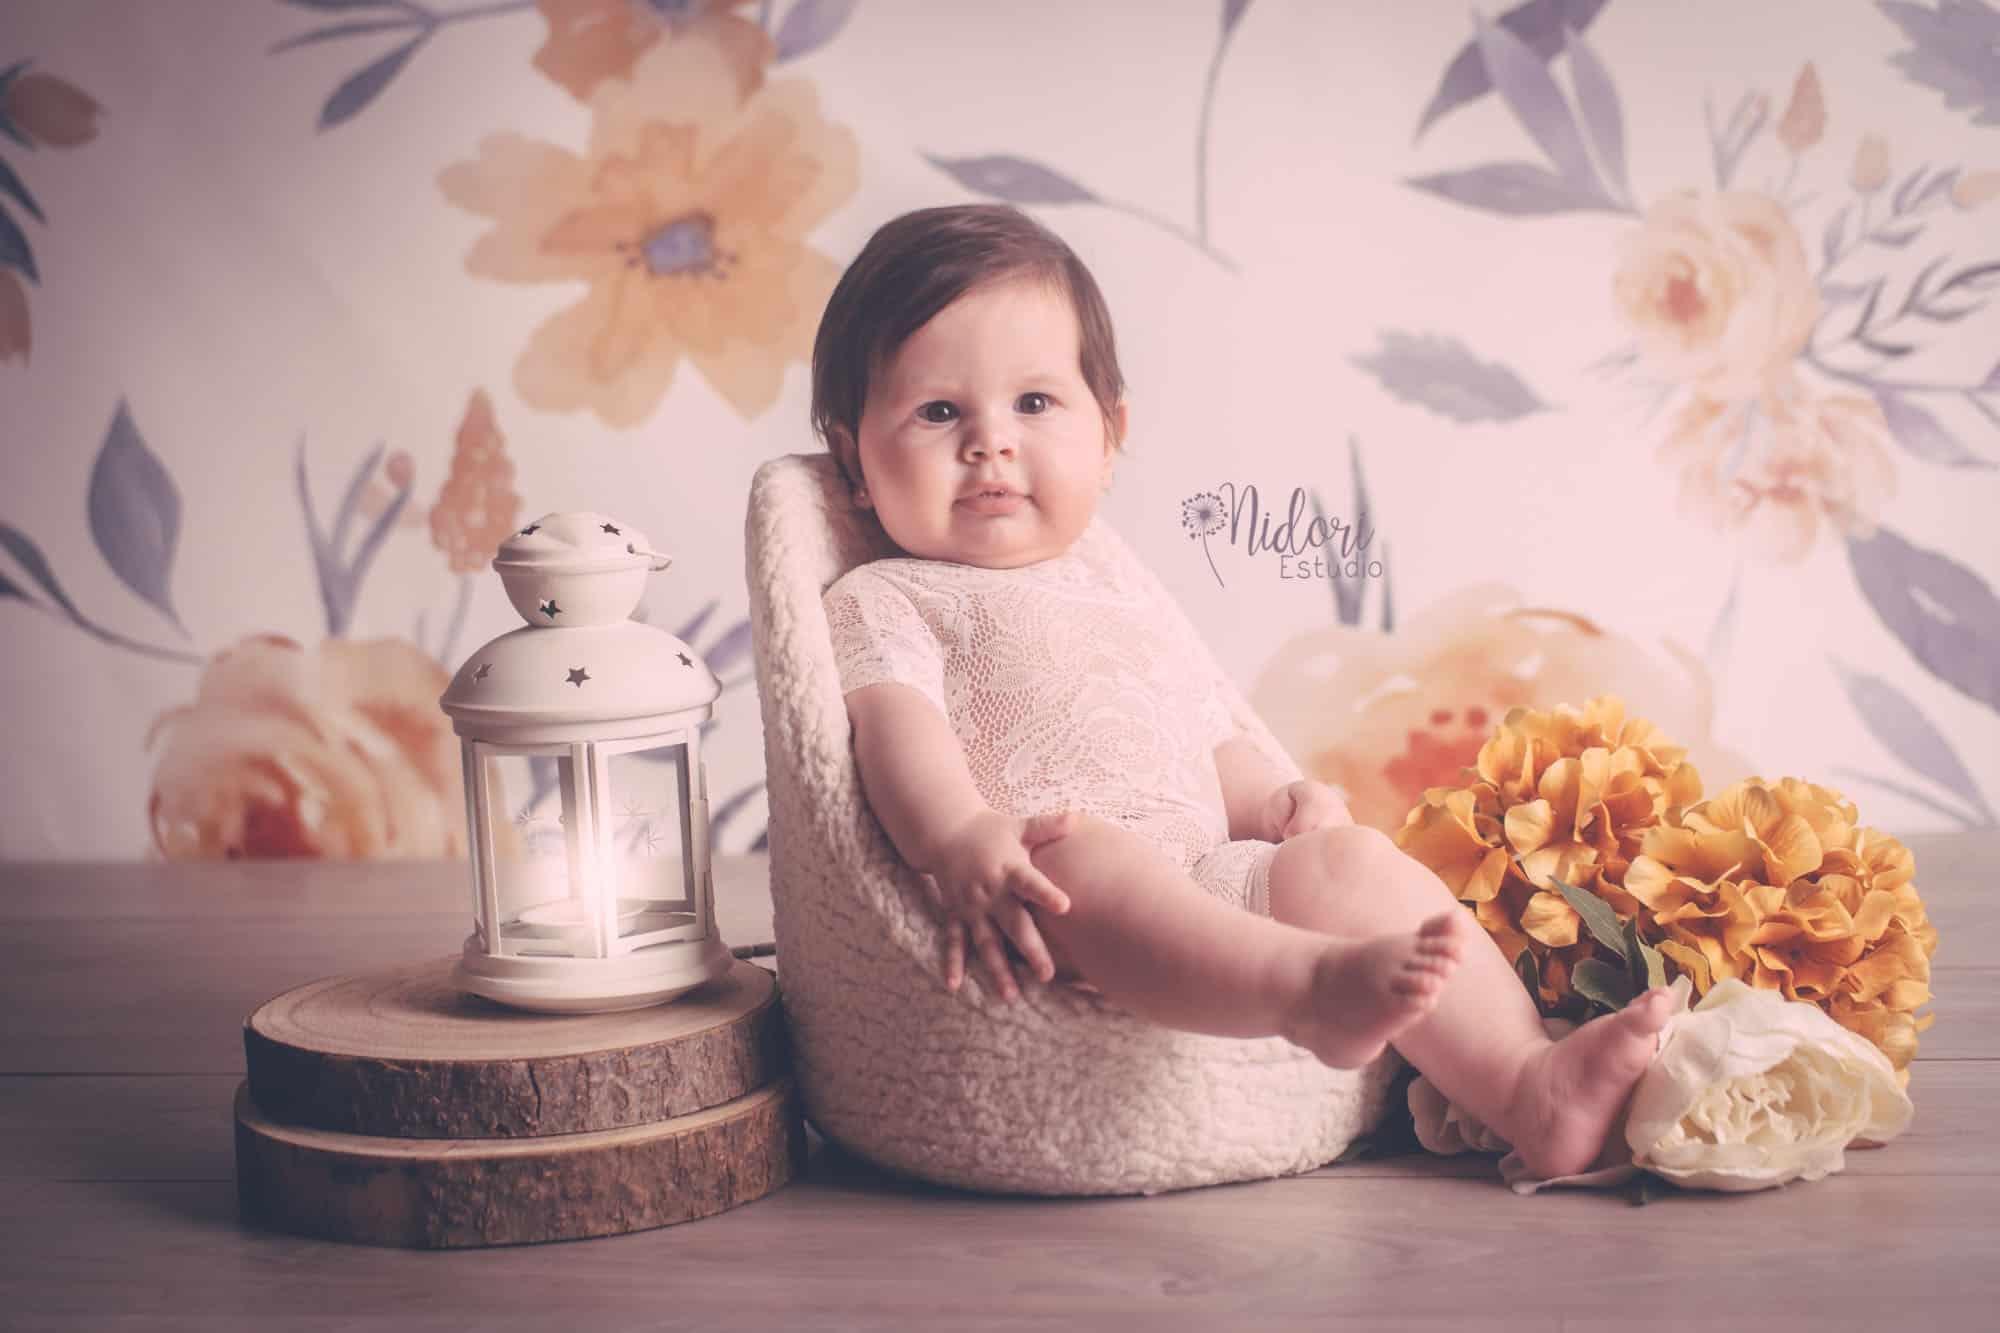 seguimiento-fotografia-niños-bebes-nidoriestudio-fotos-valencia-almazora-castellon-españa-spain-20